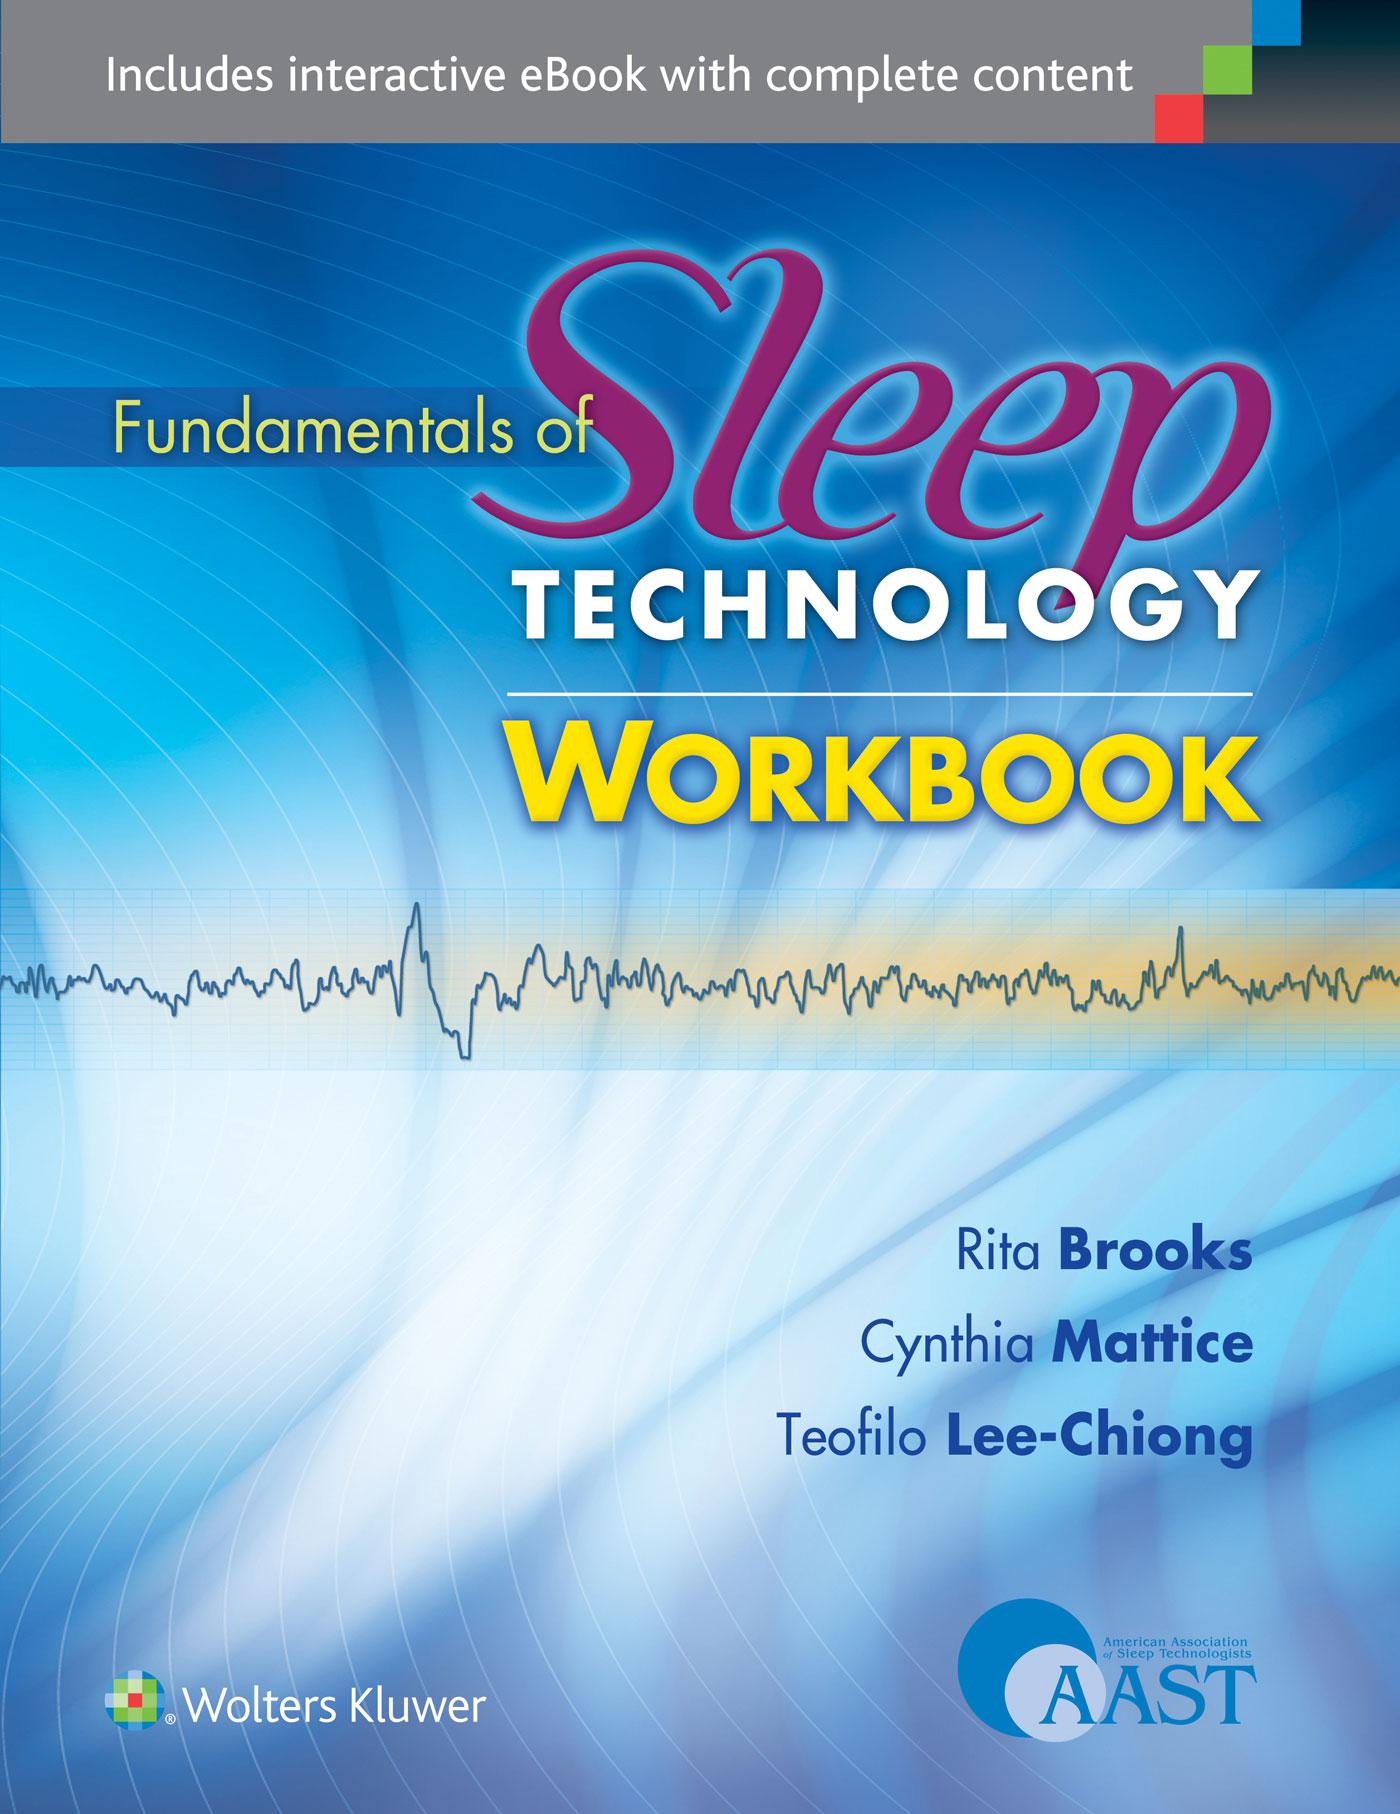 Fundamentals of Sleep Technology Workbook